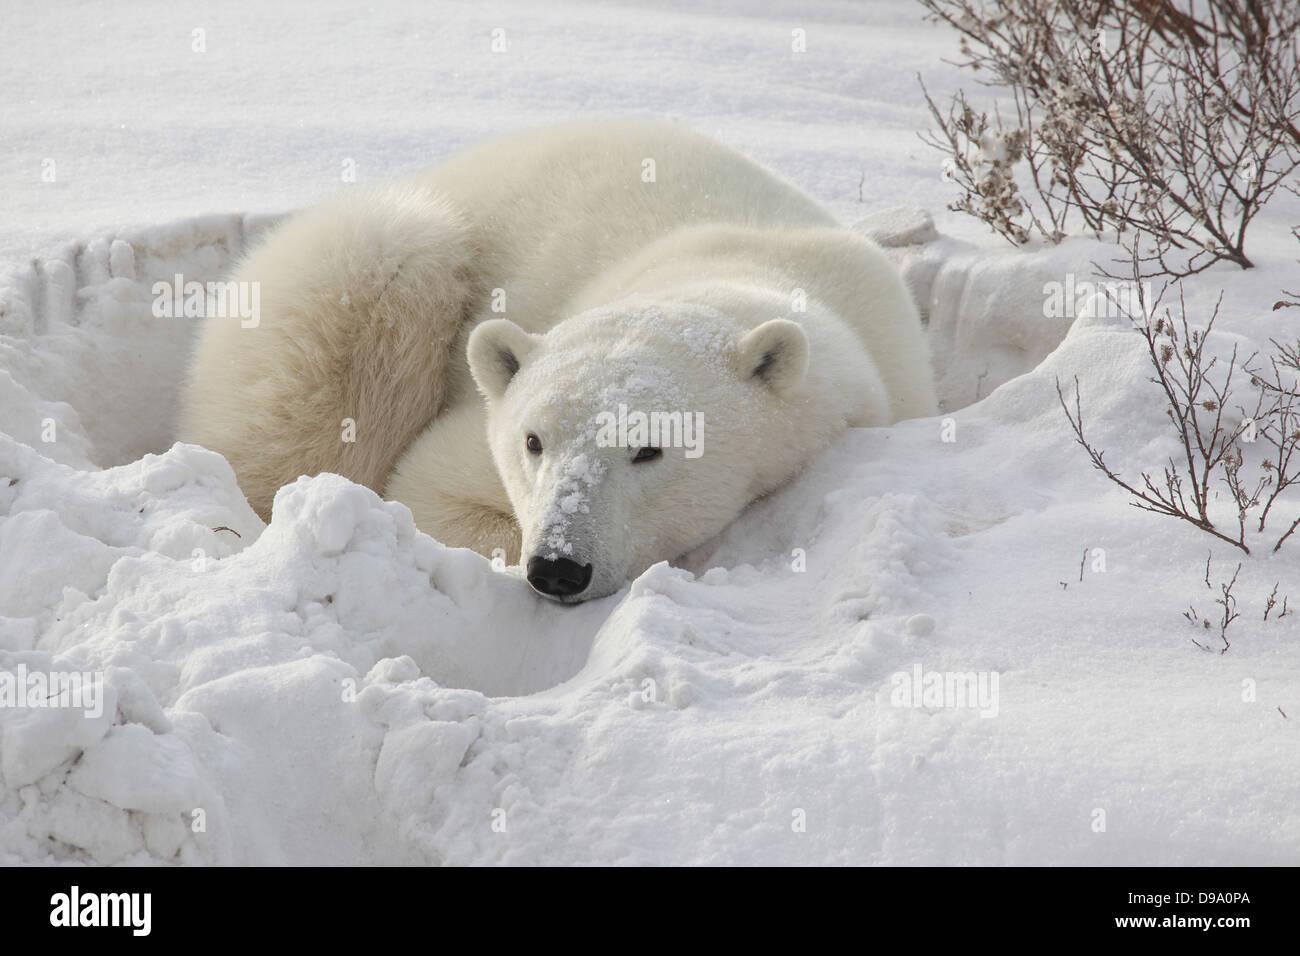 La hora de la siesta del oso polar Imagen De Stock